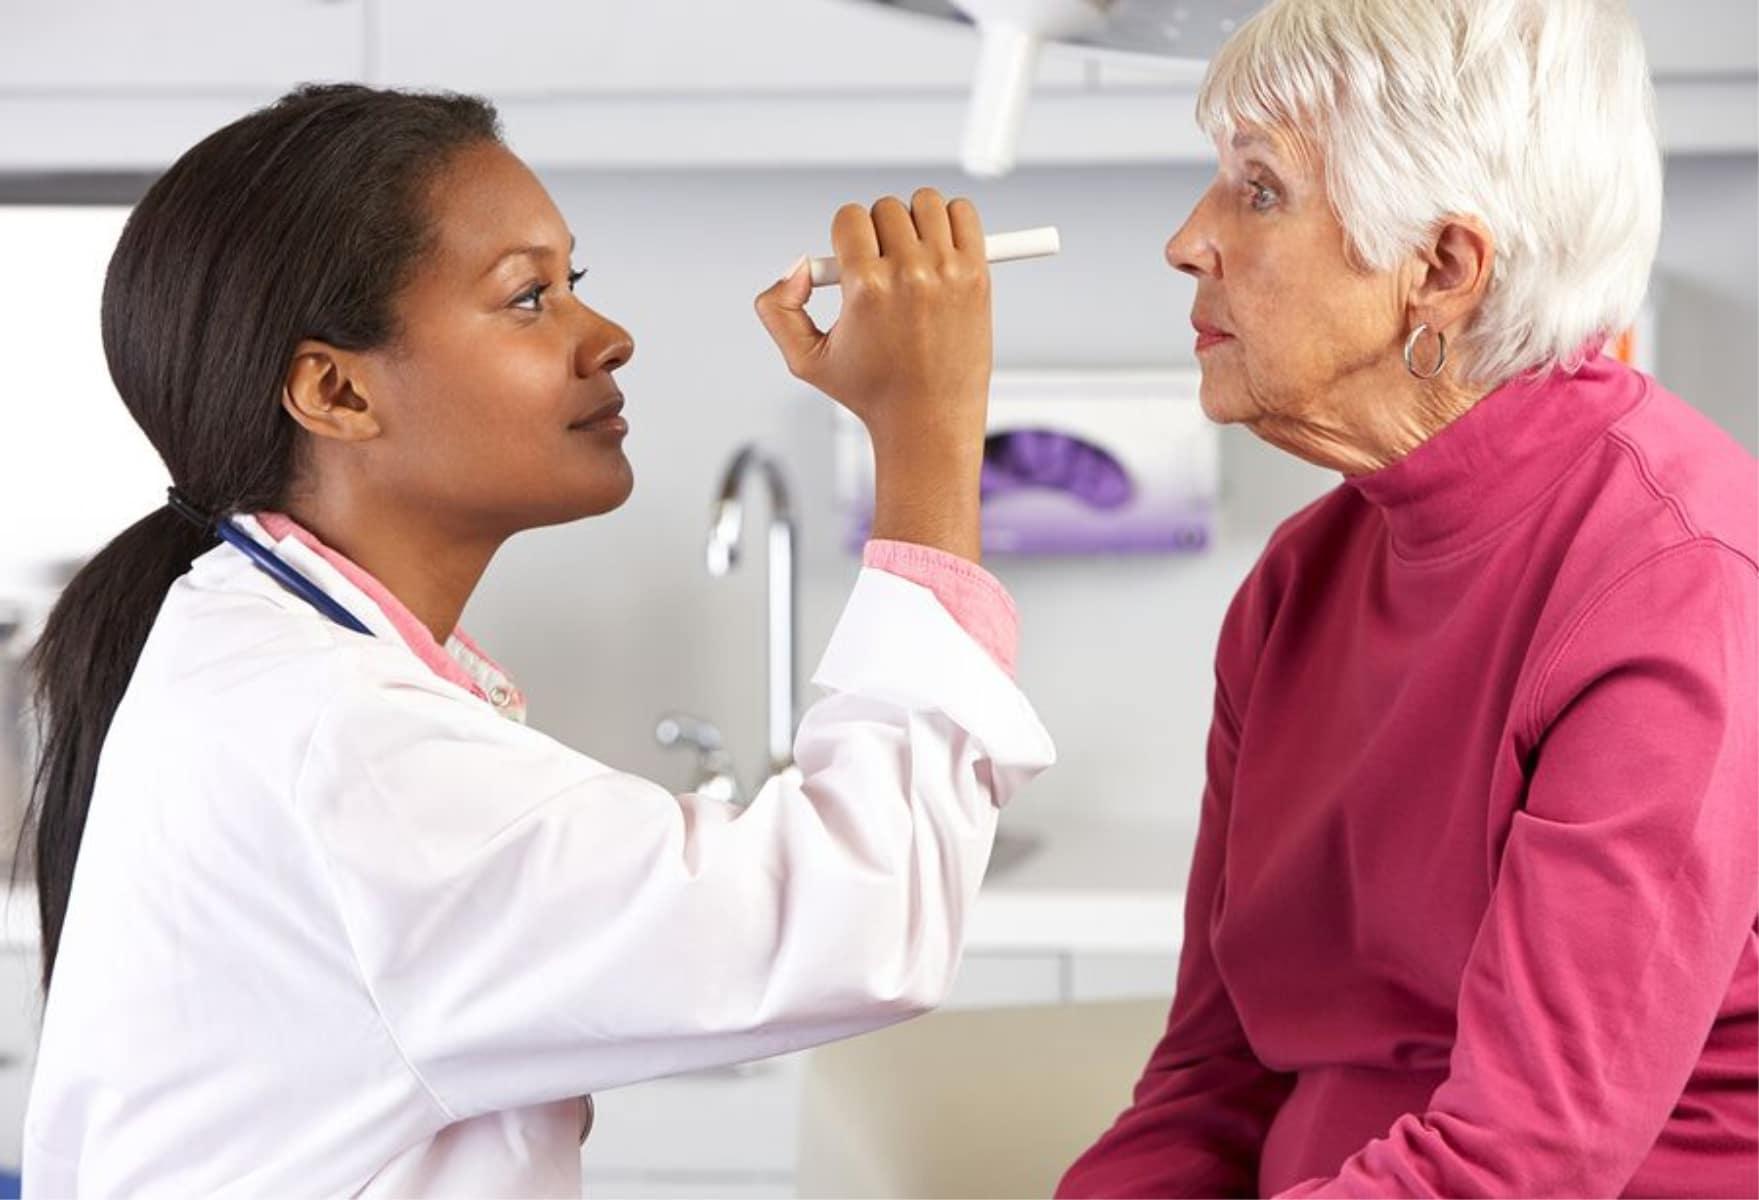 Elder Care in Gainesville GA: Needing a Geriatric Care Assessment